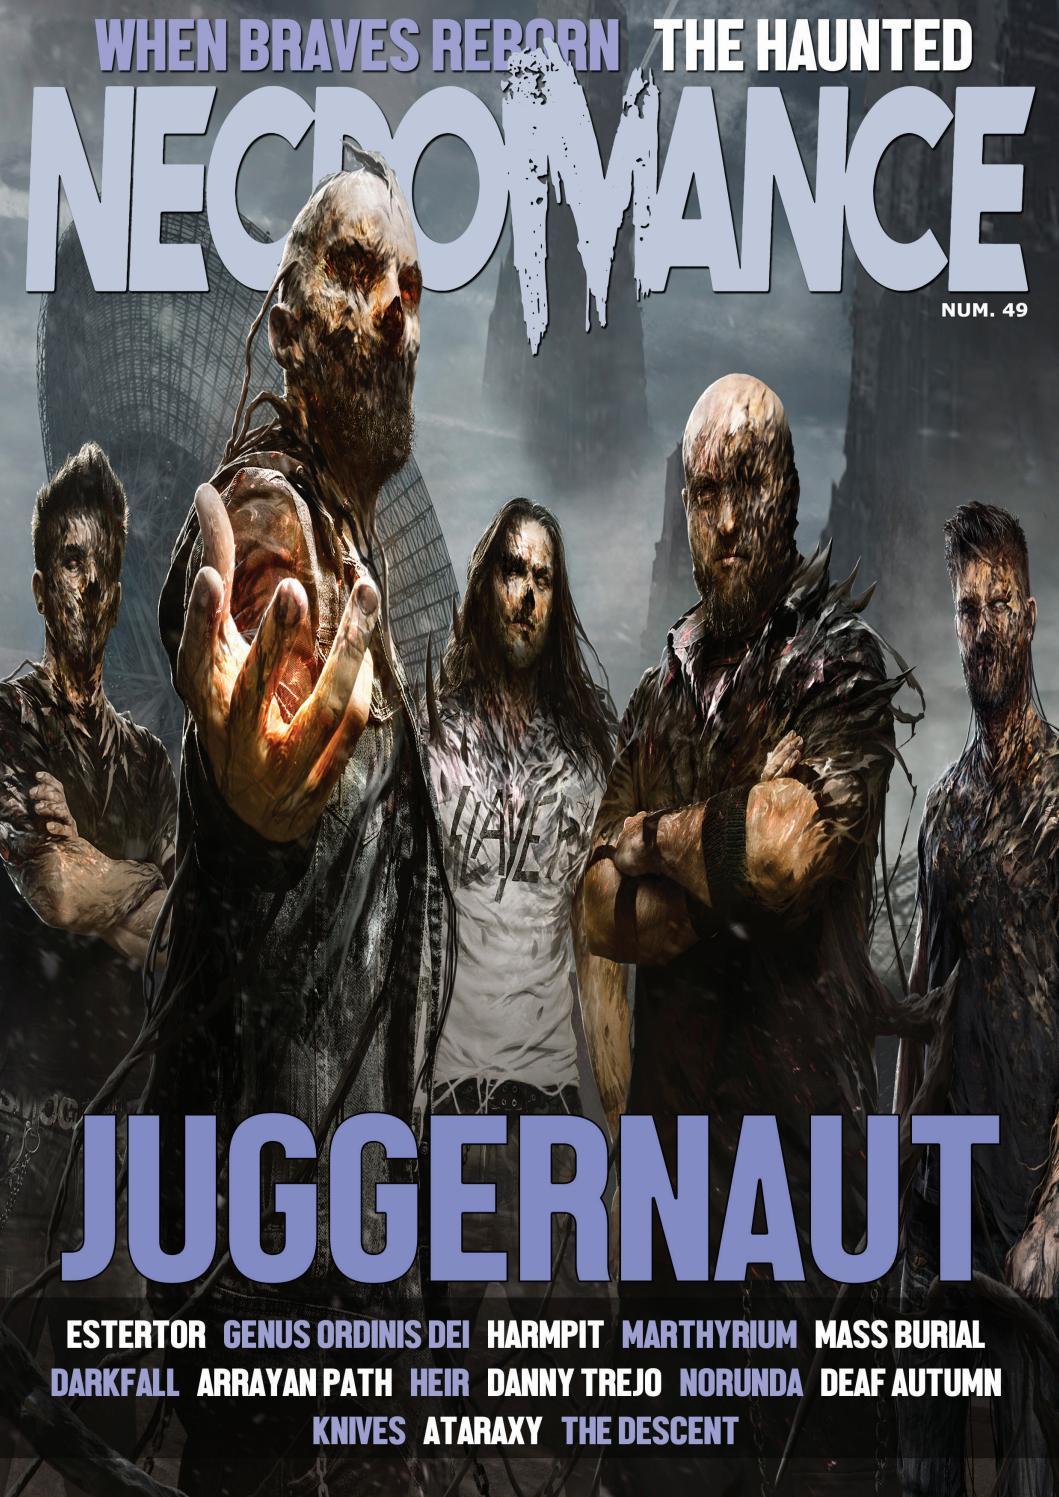 2 Rusas Recibiendo Porno Pelis Gore necromance digital magazine 49necromance magazine - issuu